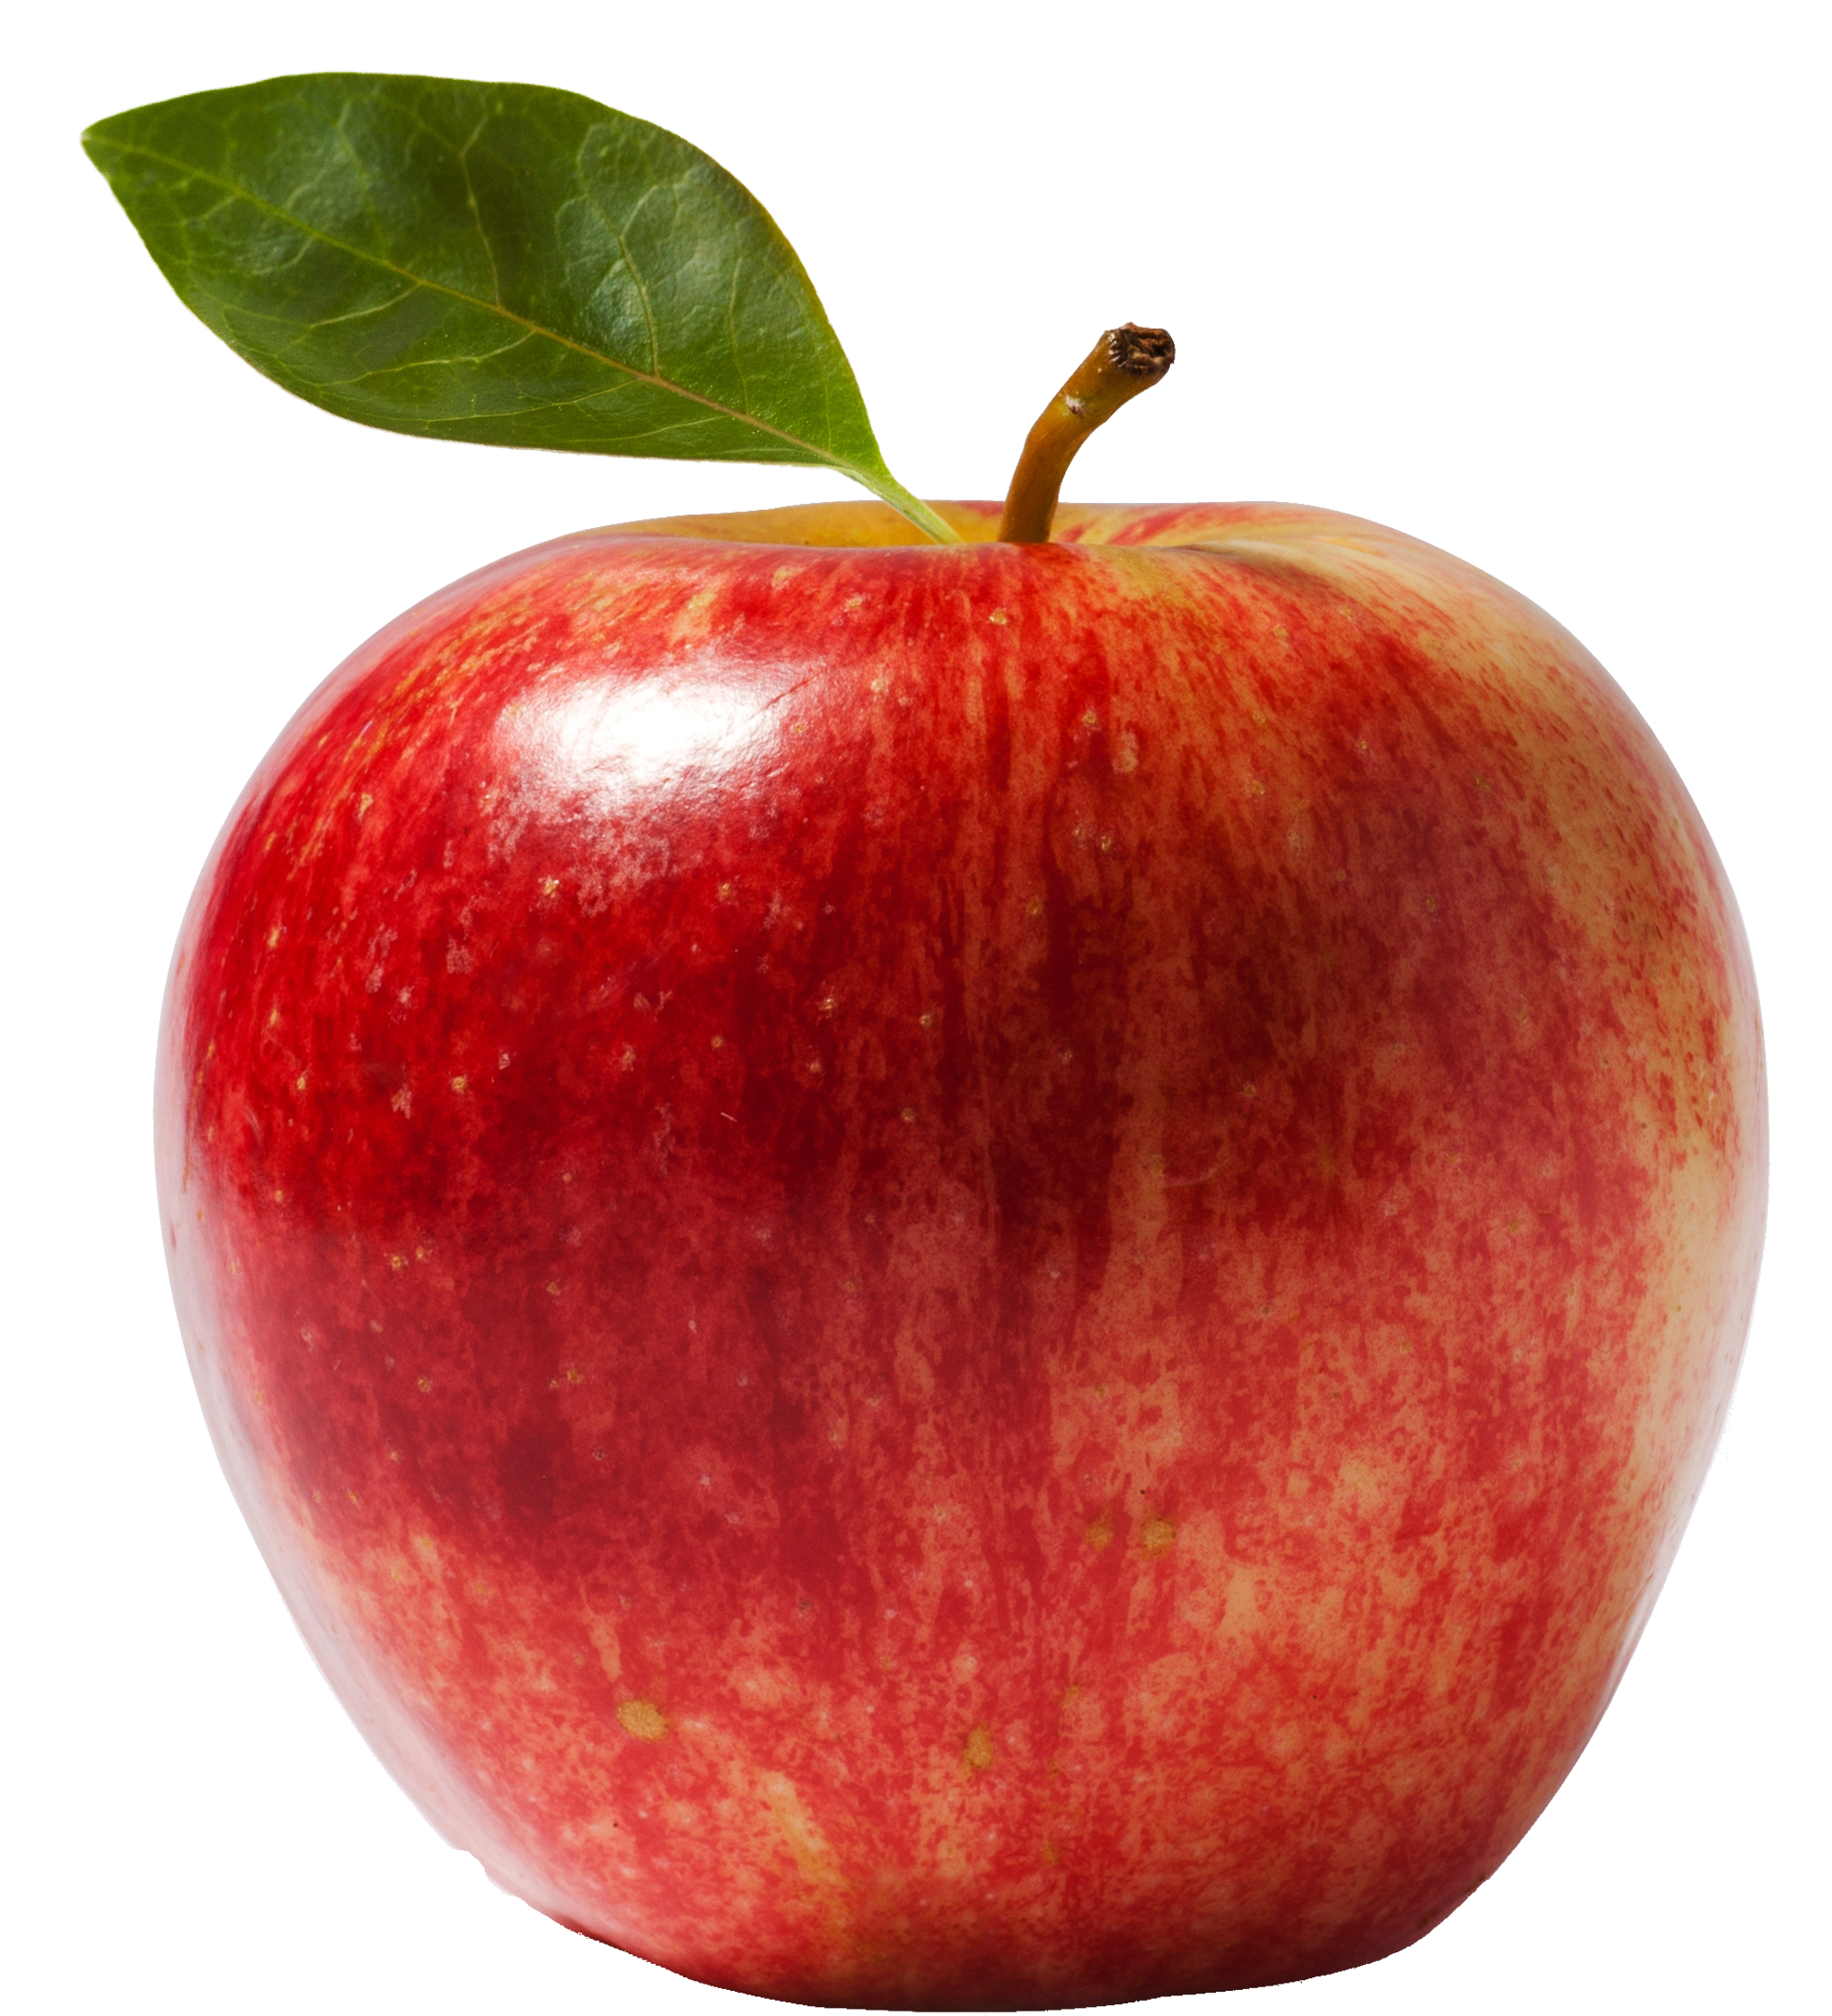 Apple Fruit Png - Apple Png Image, Transparent background PNG HD thumbnail